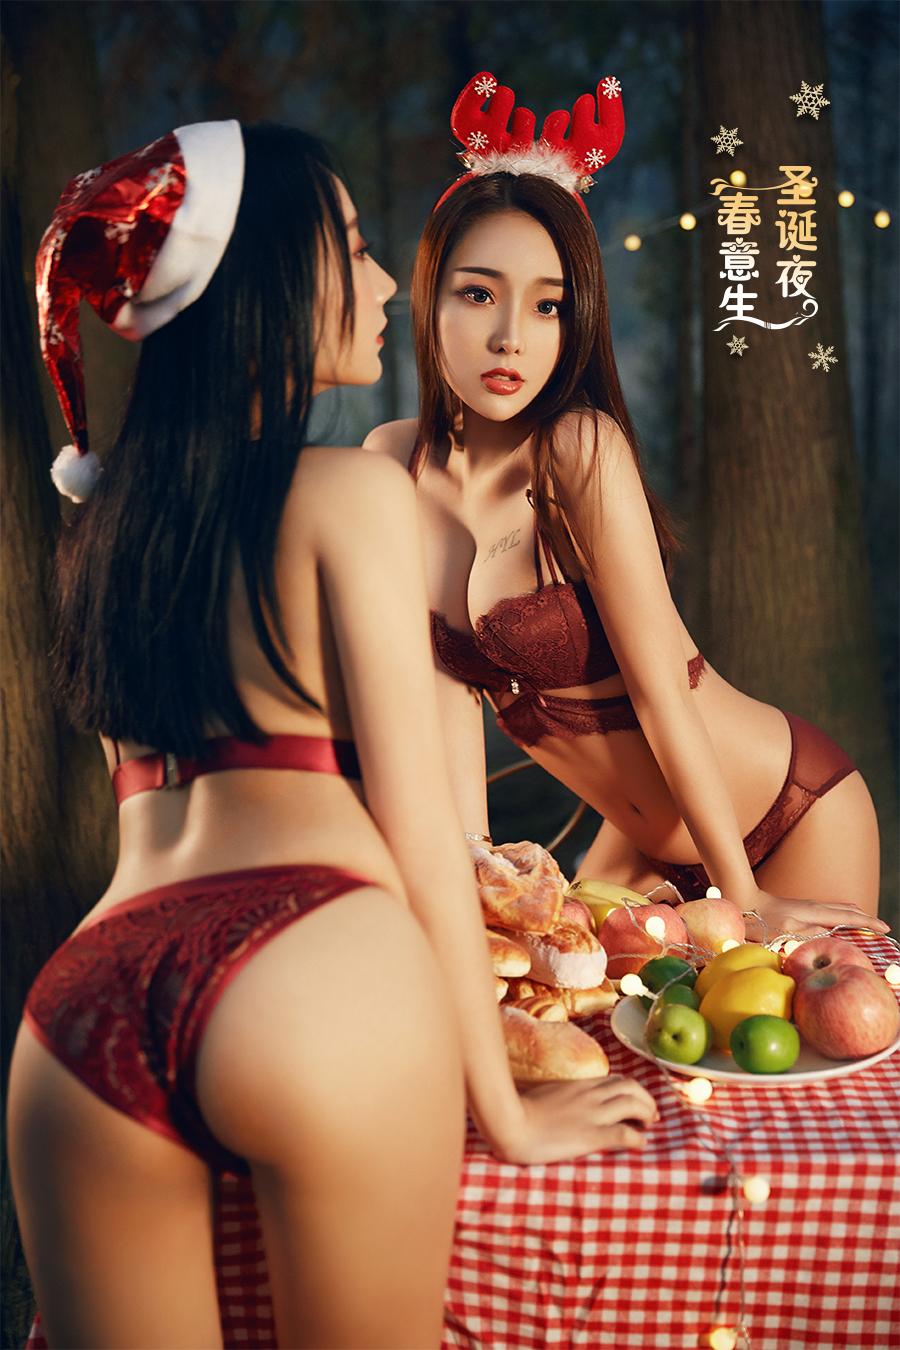 [YouMi尤蜜]2018.12.25 圣诞夜 春意生 尤蜜合辑[/29MB]